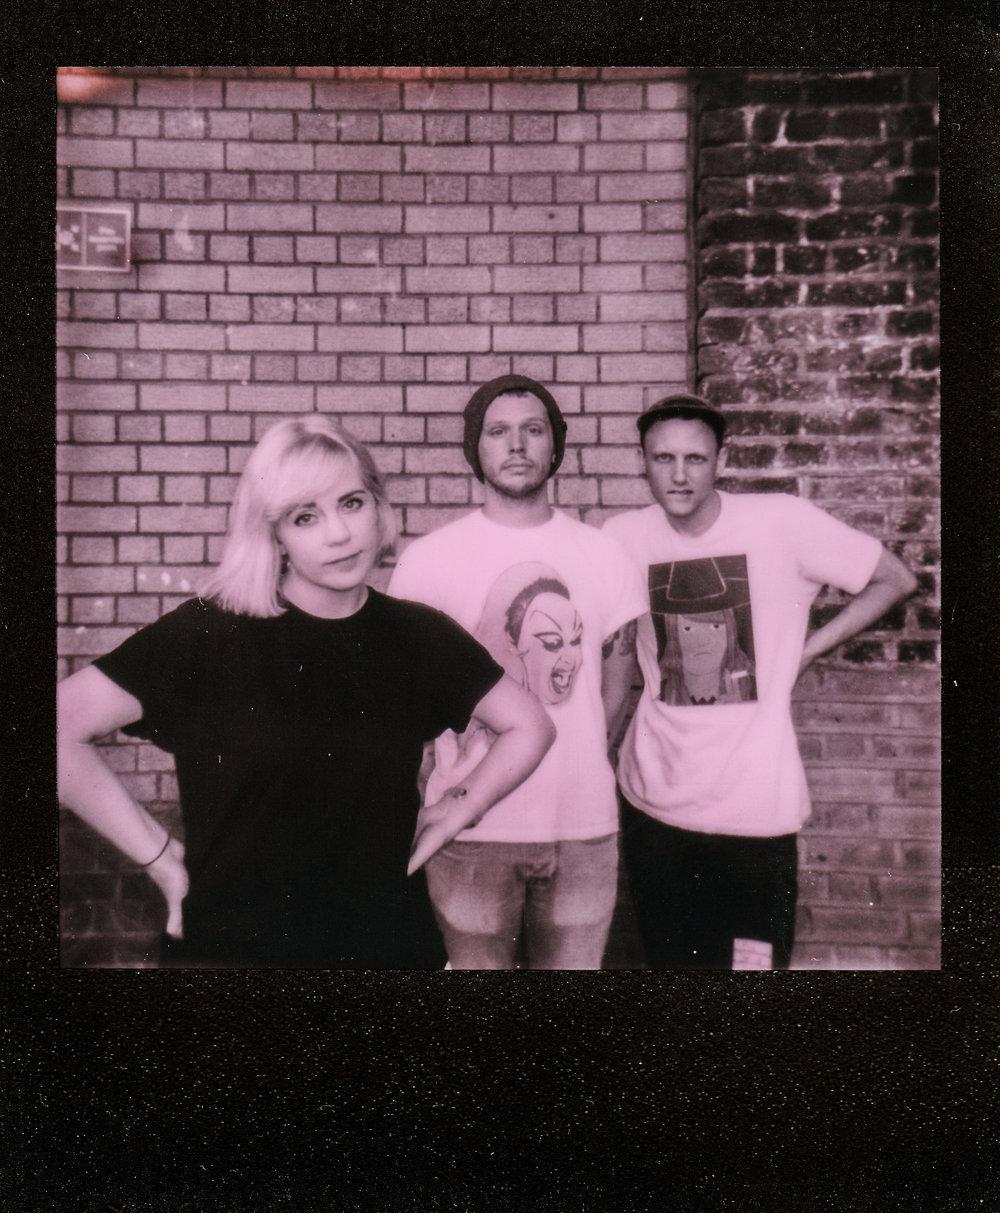 Doe Polaroids - Corsica Studios - 21.06.2017 - Ant Adams-5.jpg